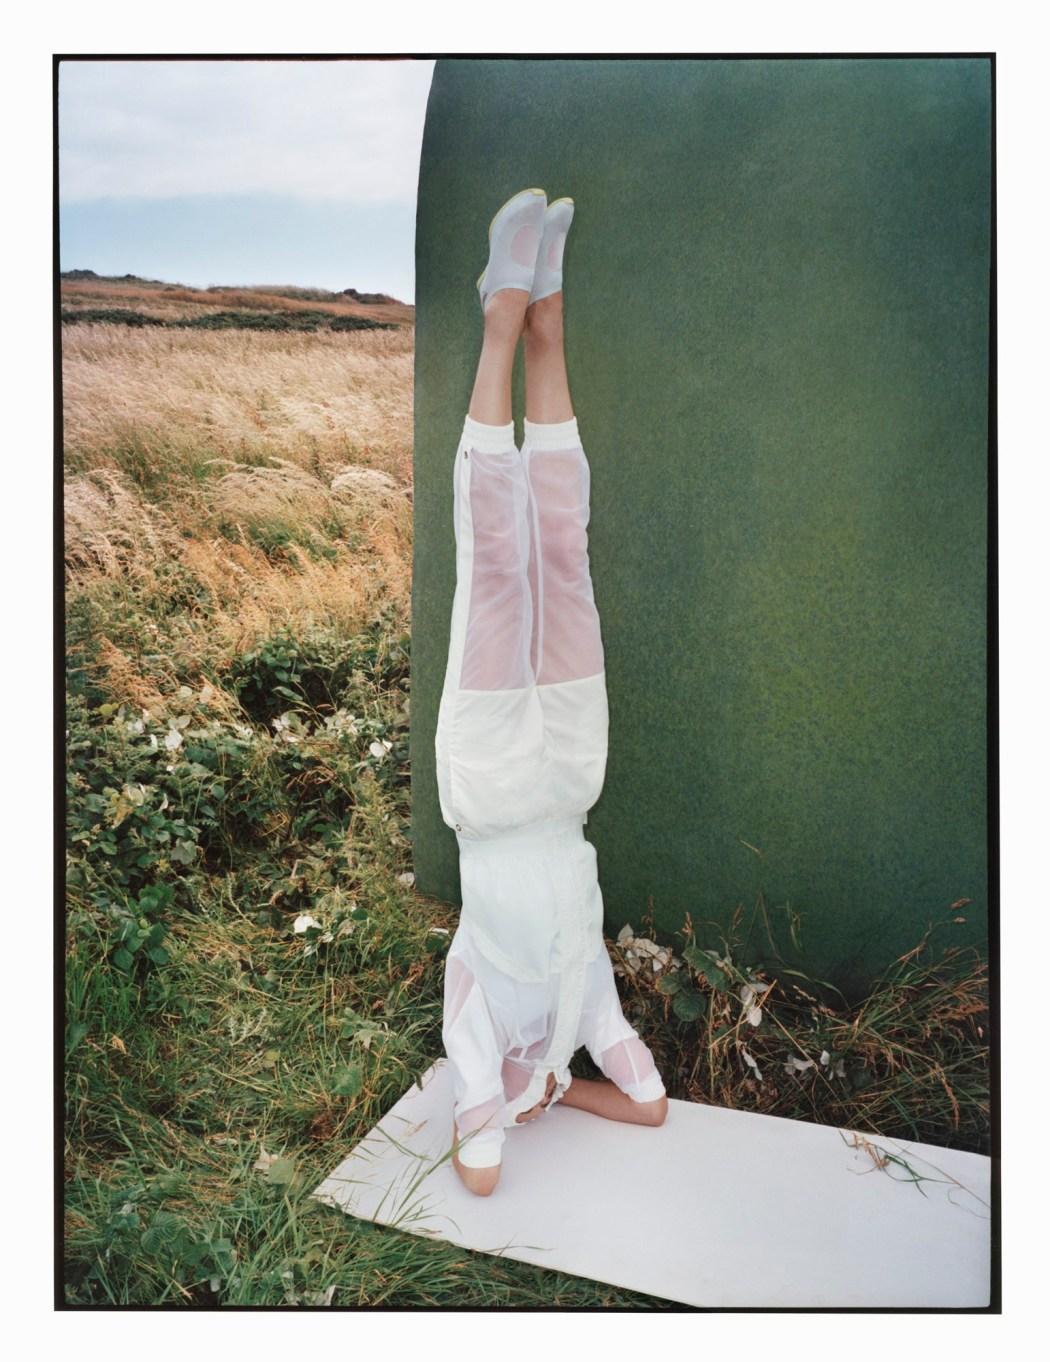 Yoga瑜珈系列 白色透膚拼接外套$4,200_白色無縫線合身背心$2,600_白色透膚拼接七分褲$3,800_皆1月上市